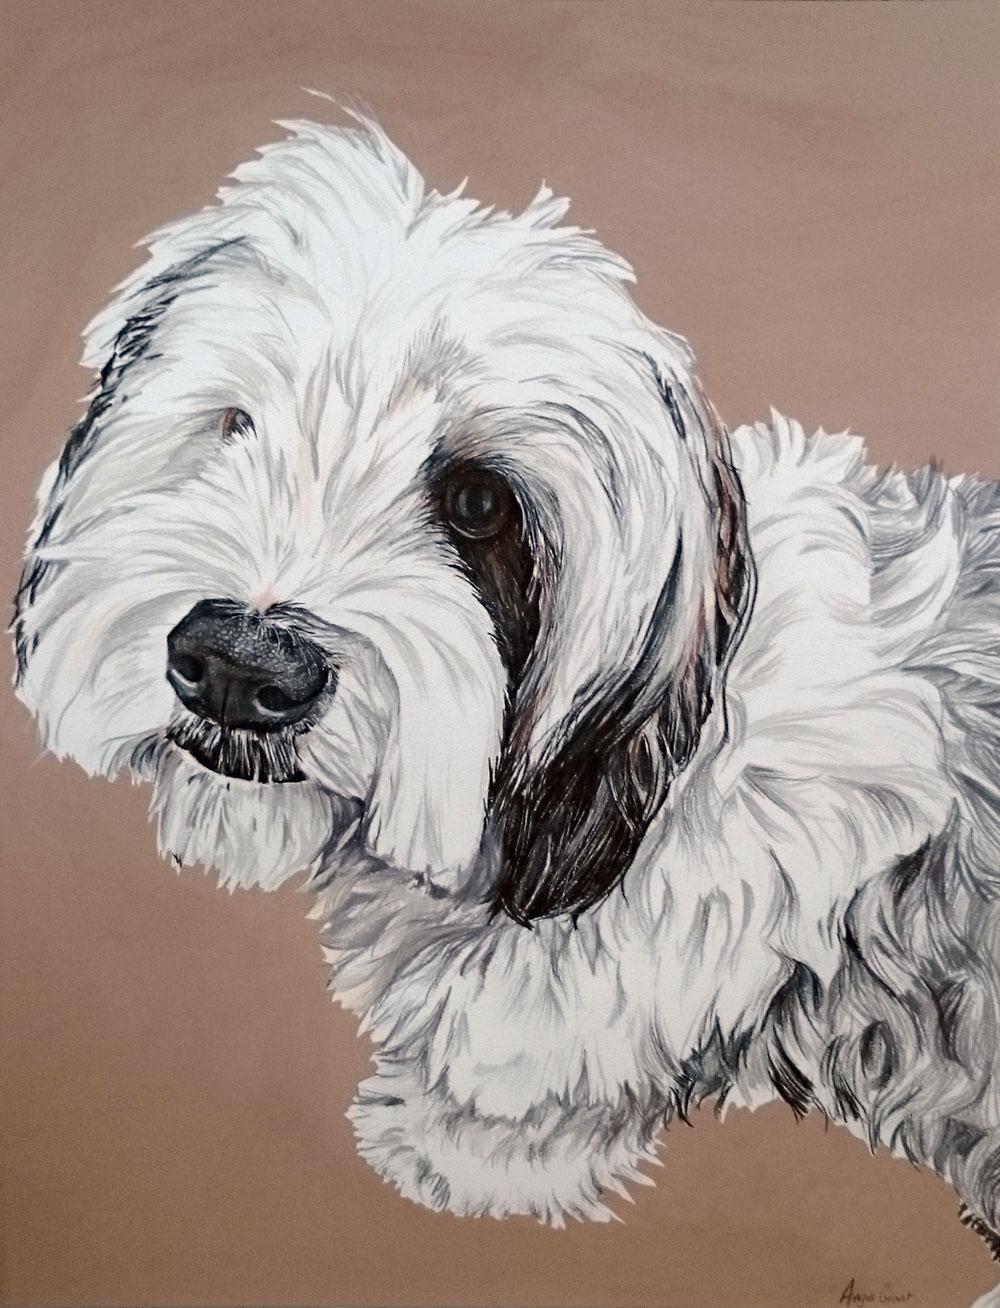 Brodie pet portrait by Angus Grant